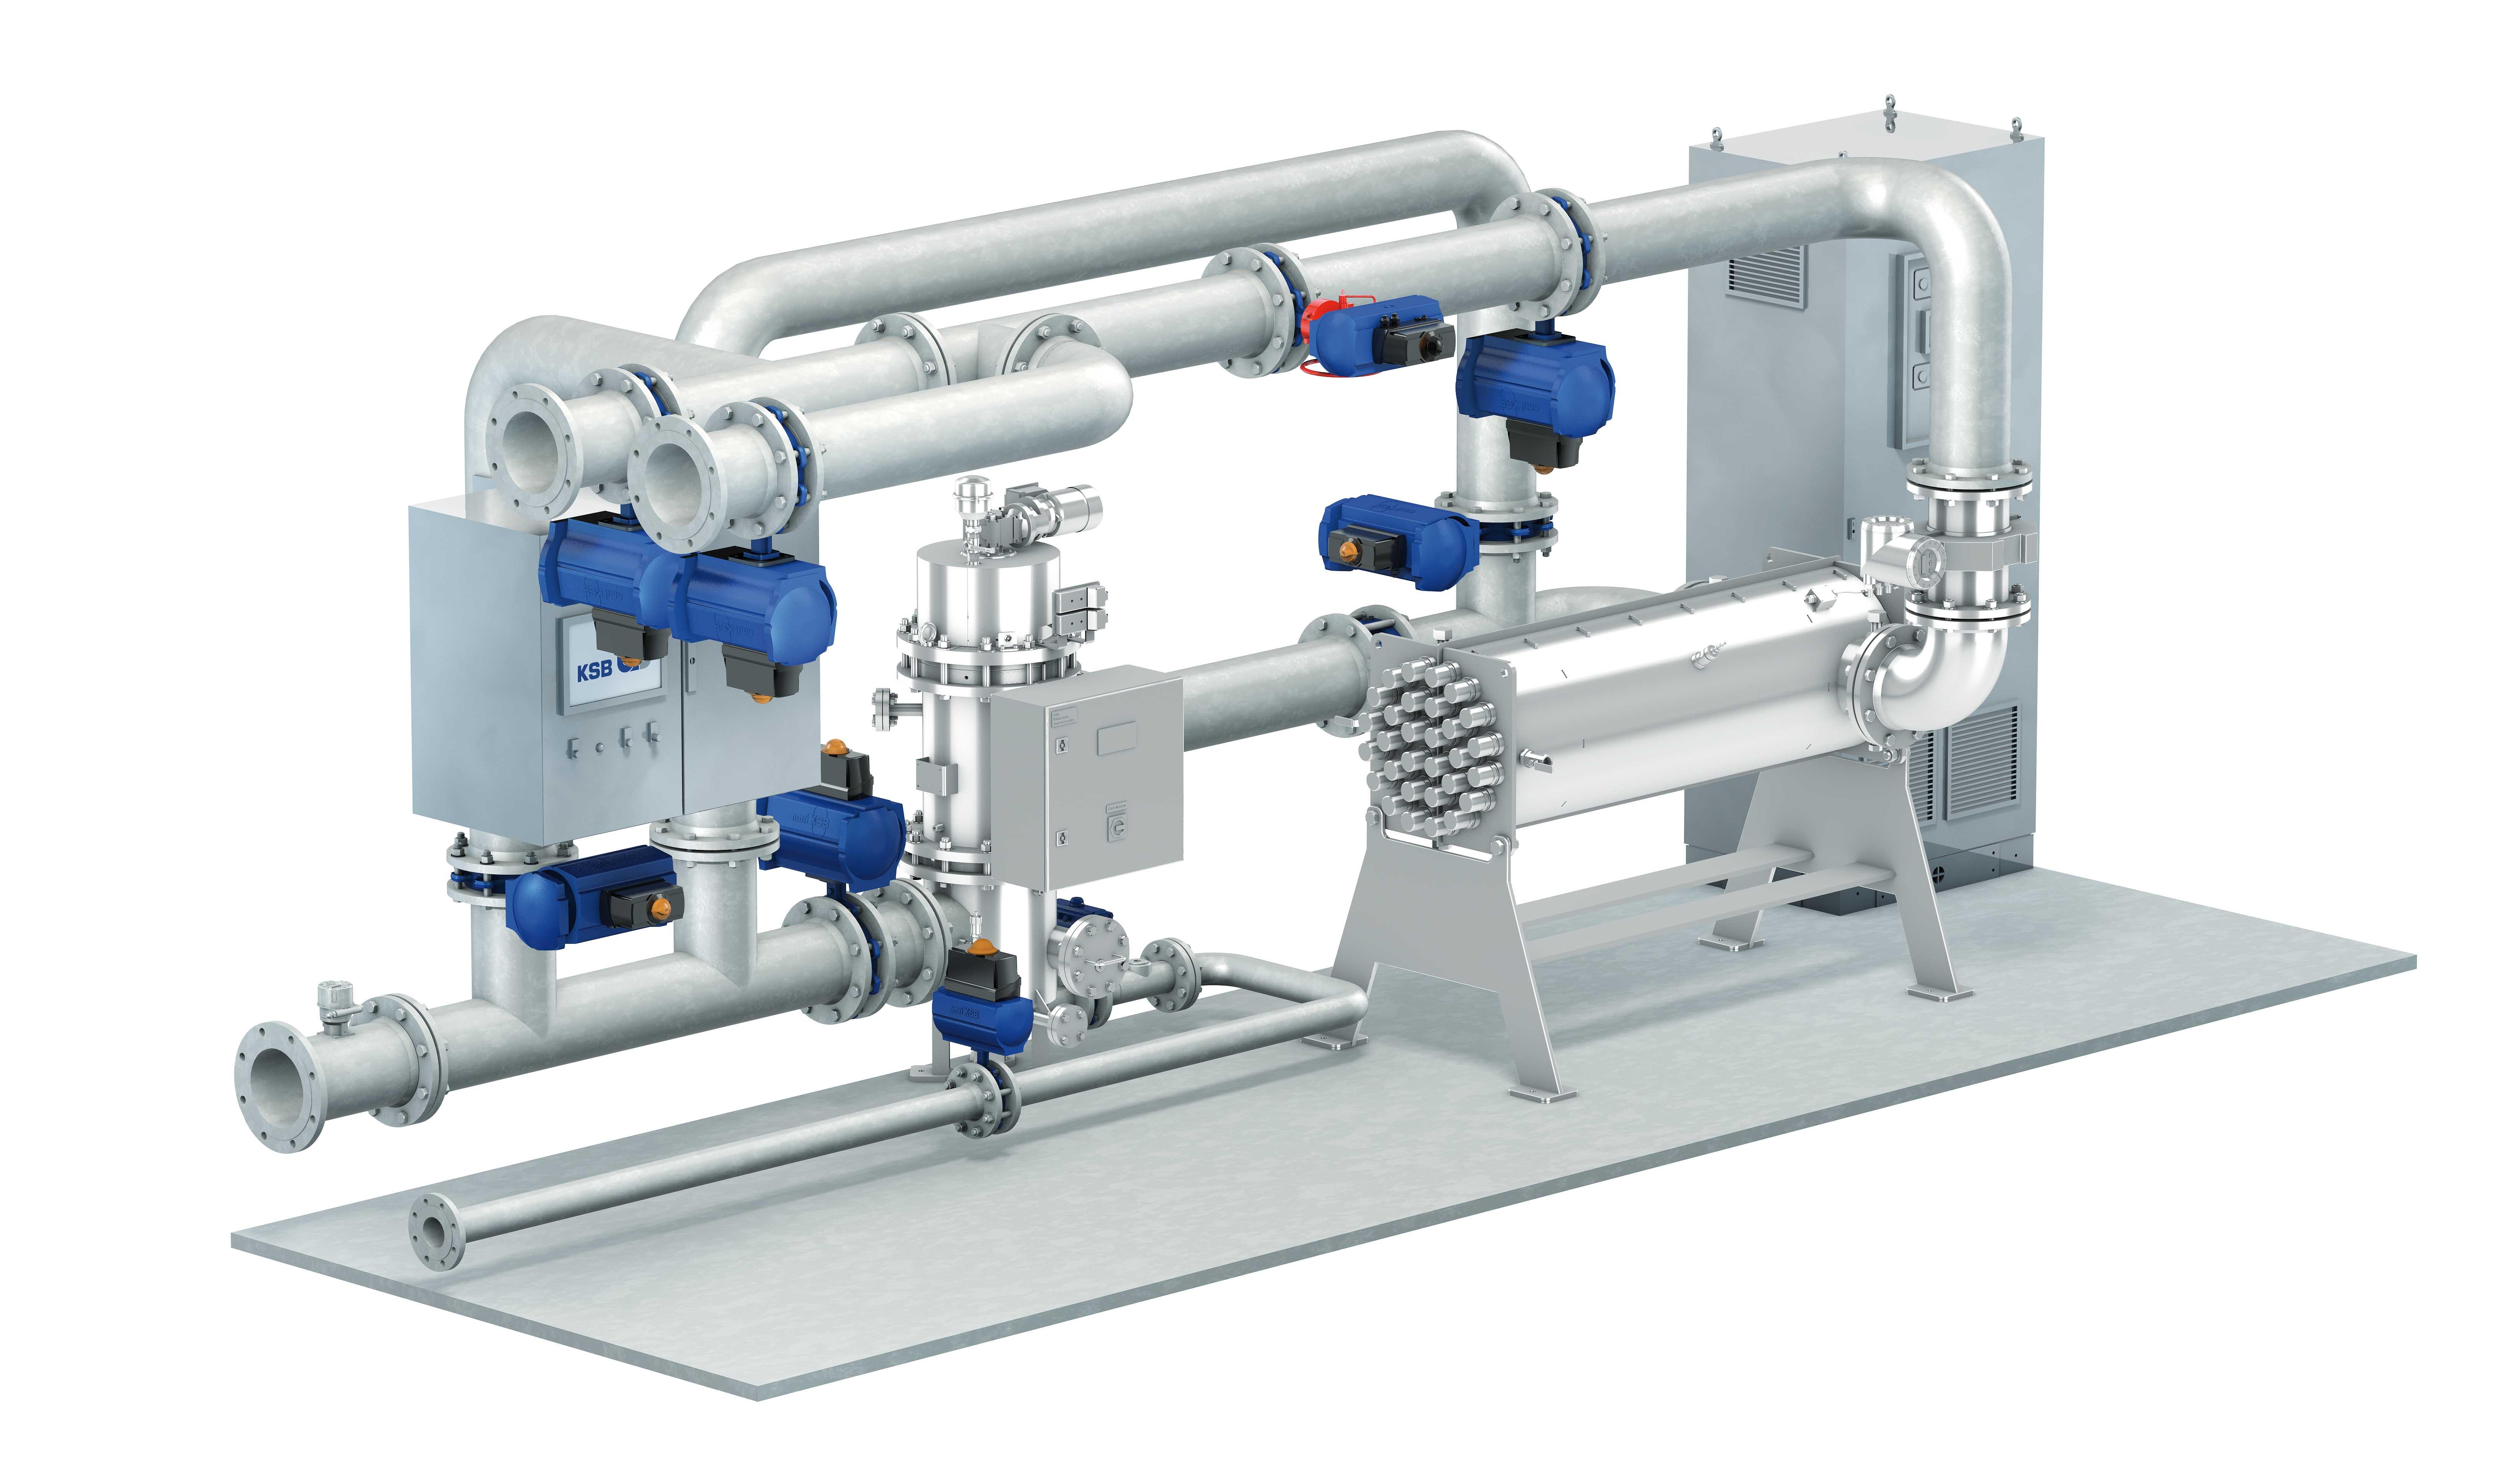 Water Treatment System : Ballast water treatment system ksb